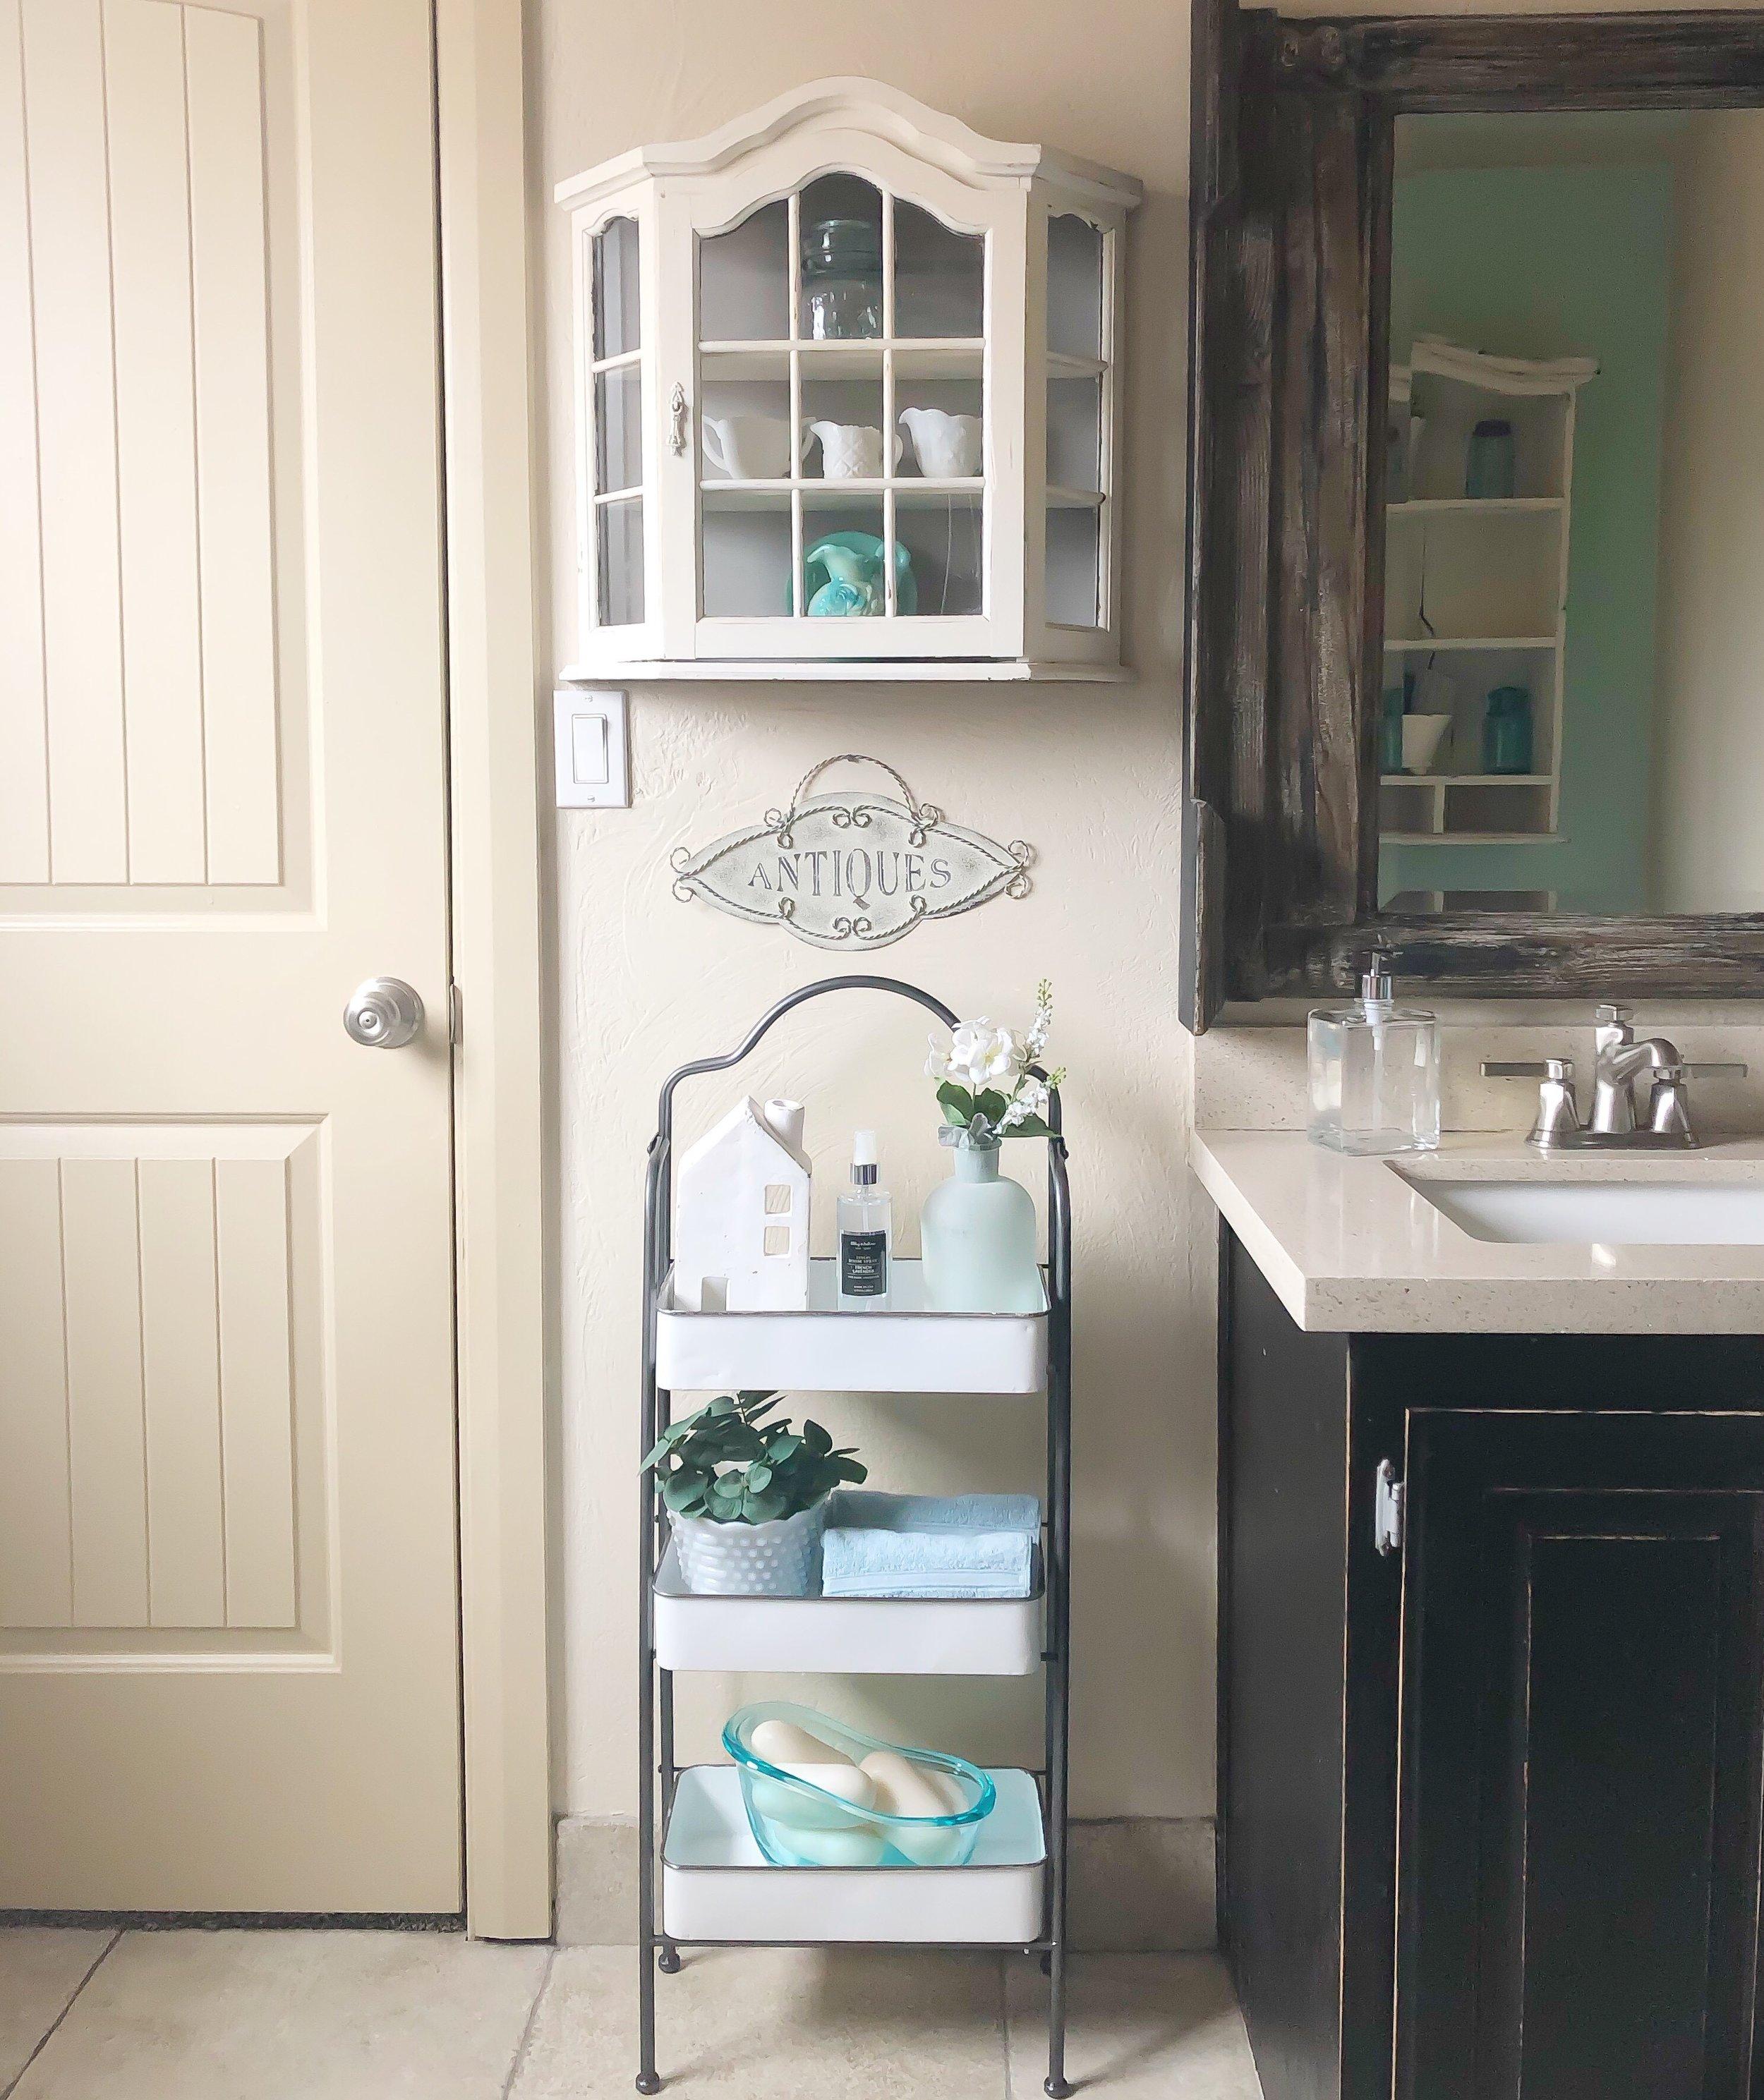 Kirkland's - Bathroom Decor